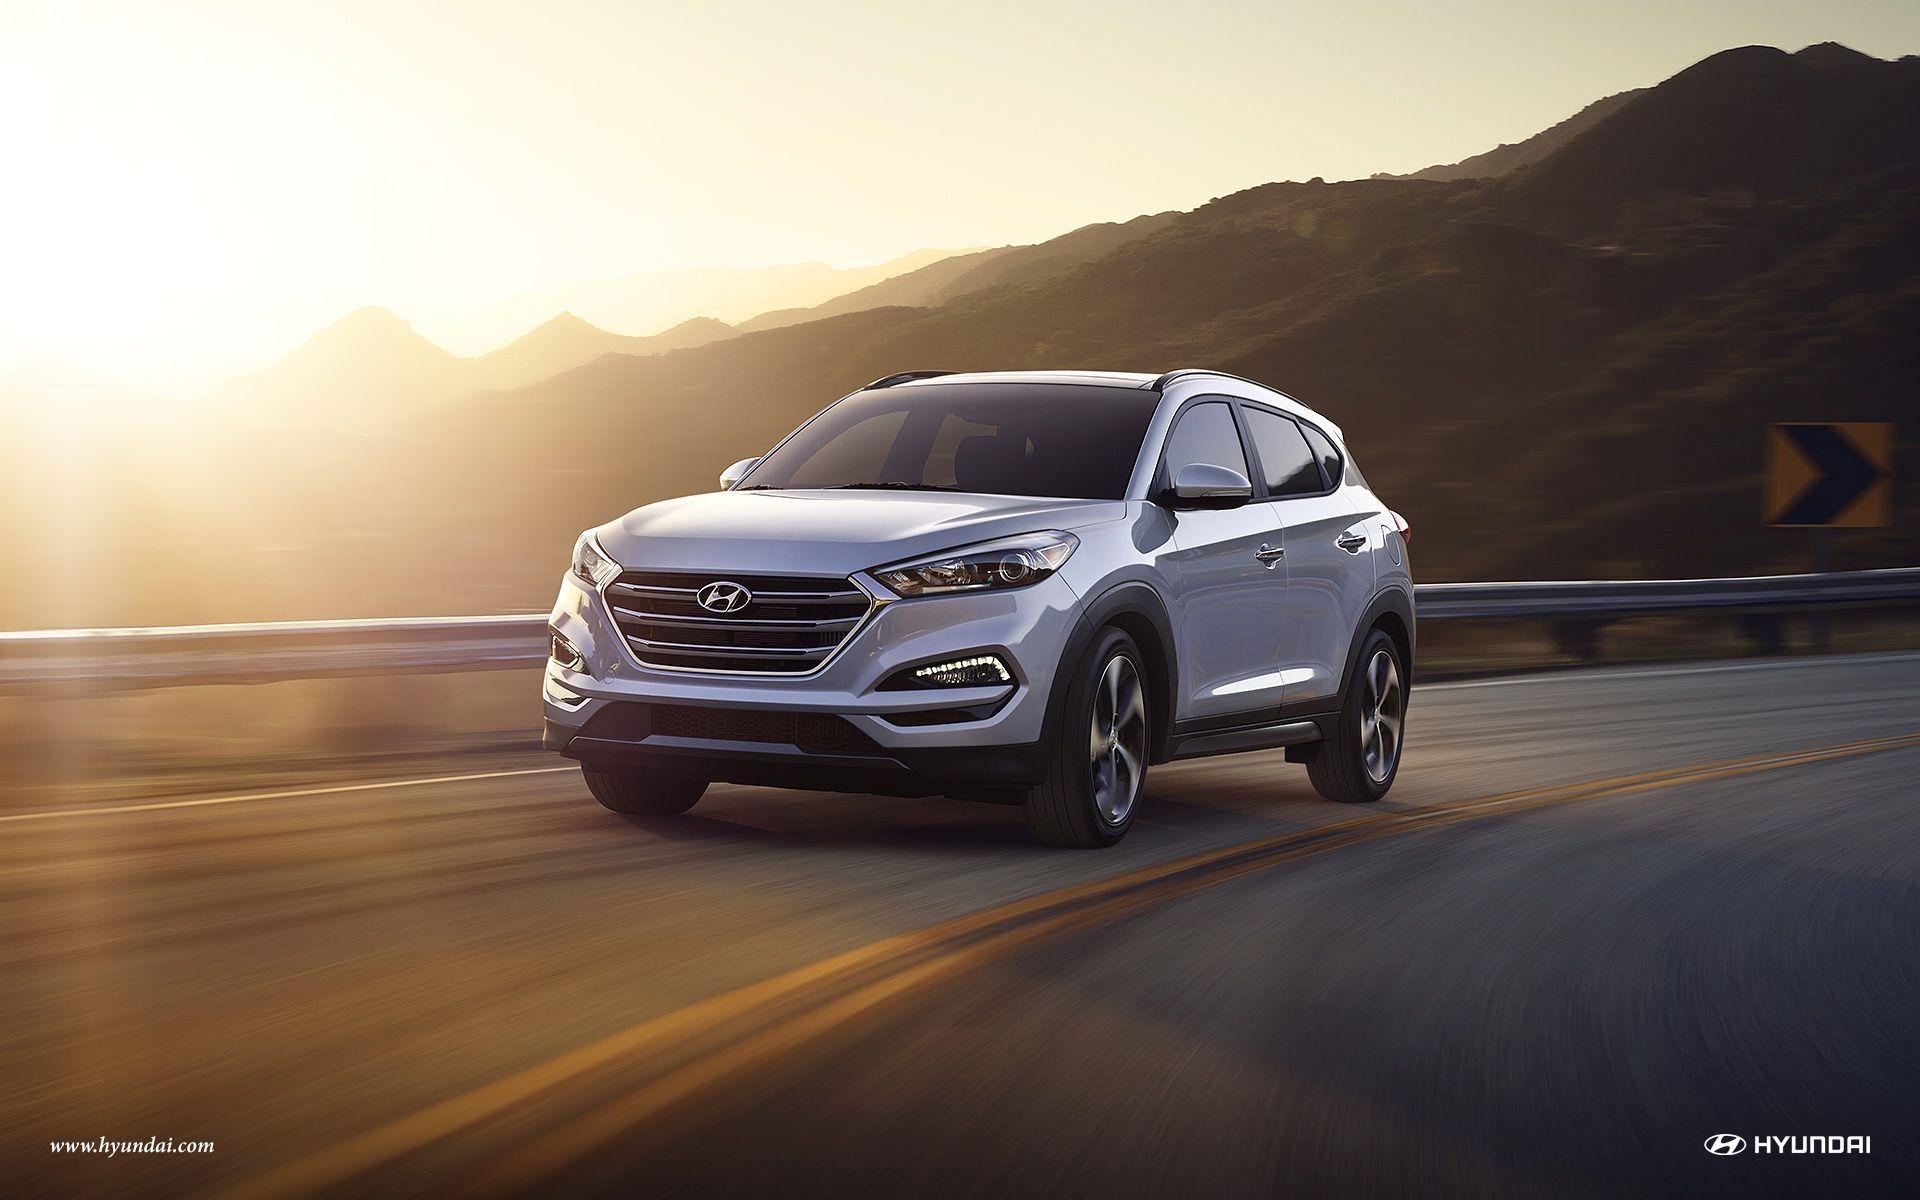 Dealerships Offer 2017 Hyundai Tucson Near Rio Rancho